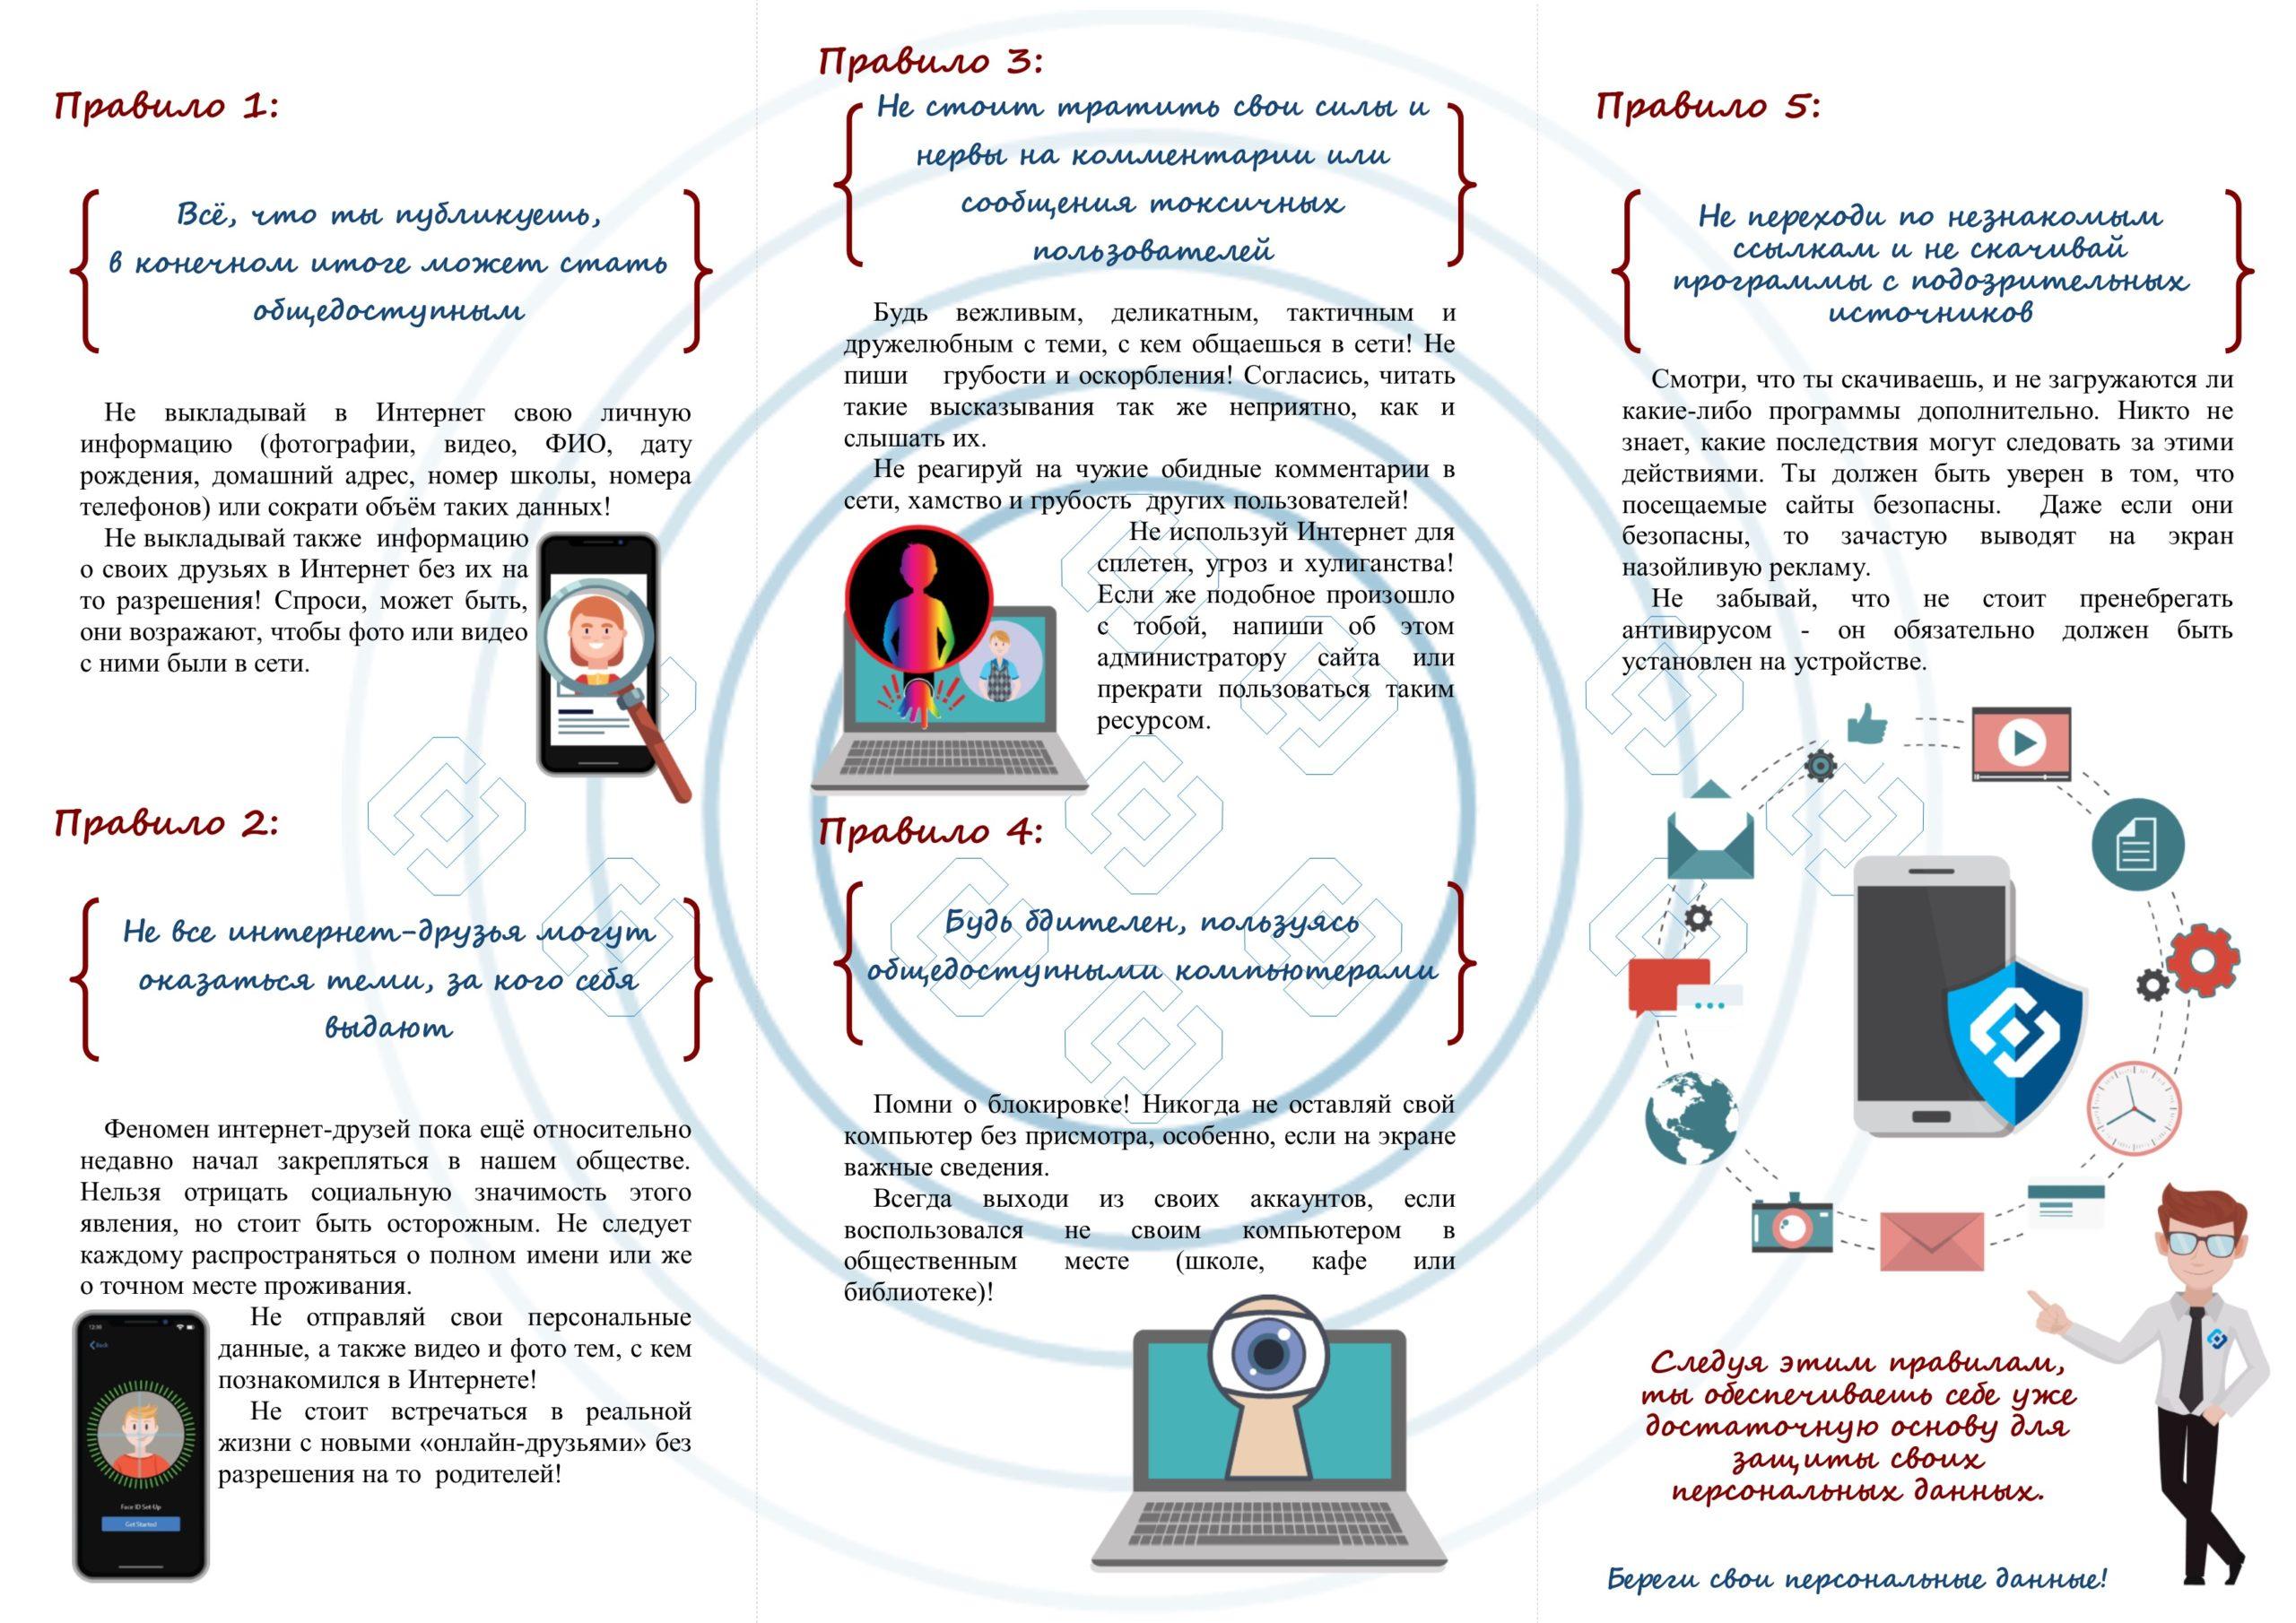 Памятка по защите персональных данных